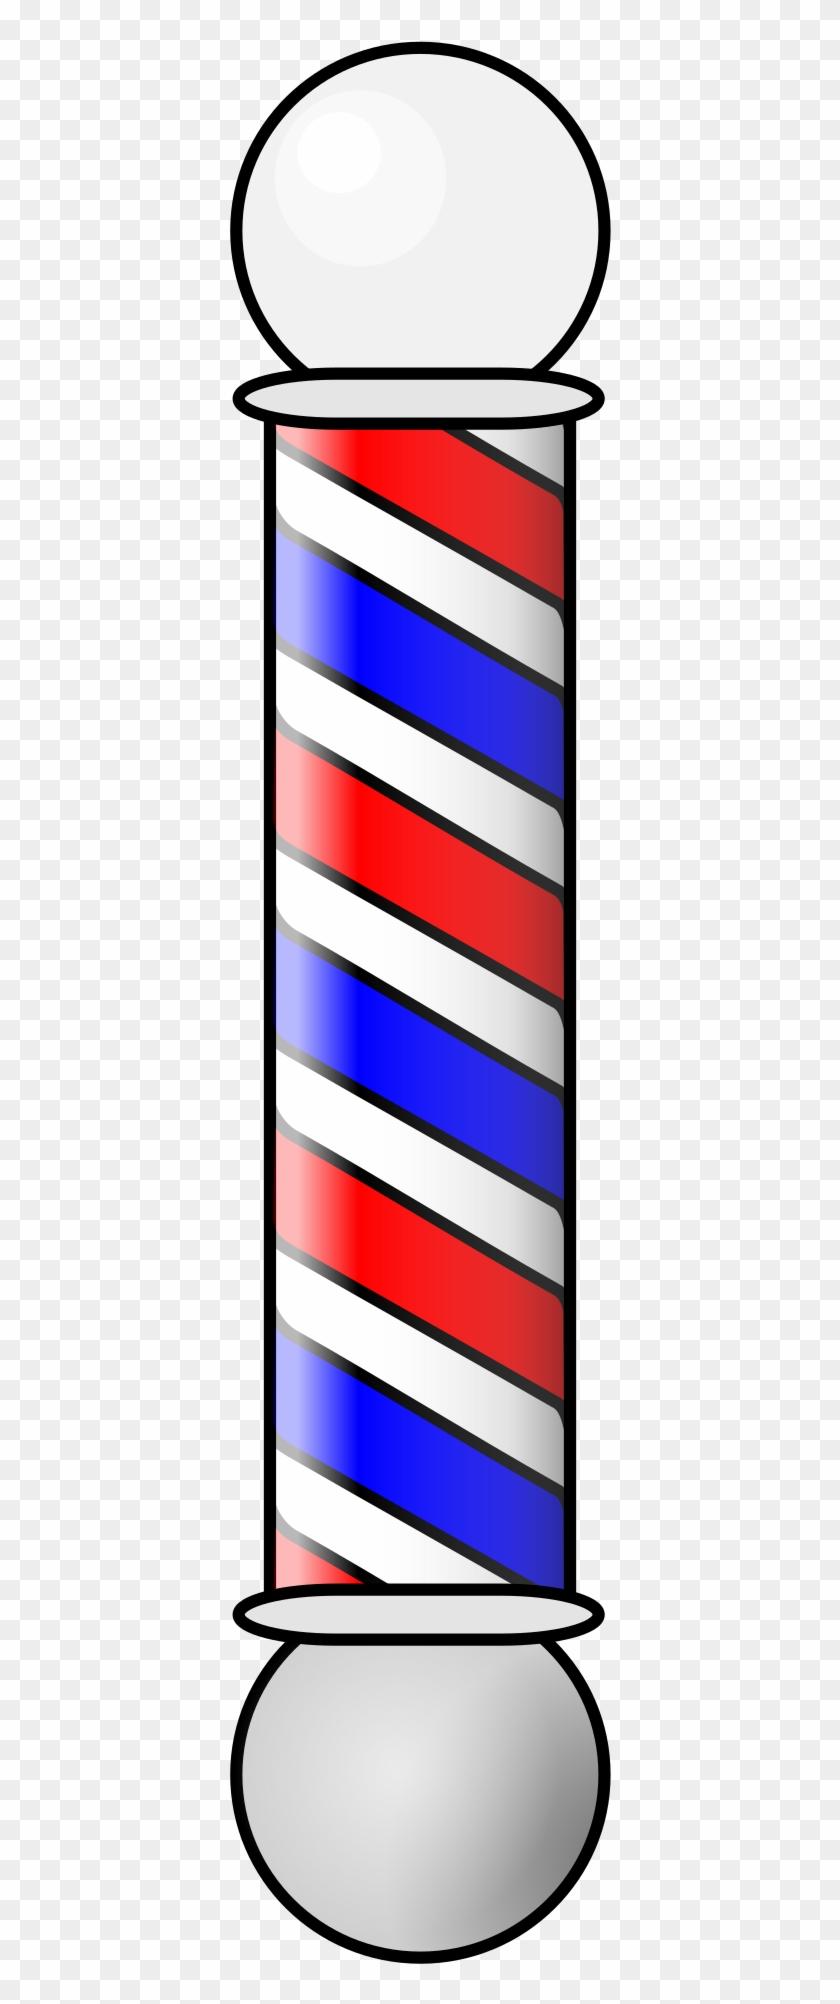 Animated Barber Pole Barbershop Pole...